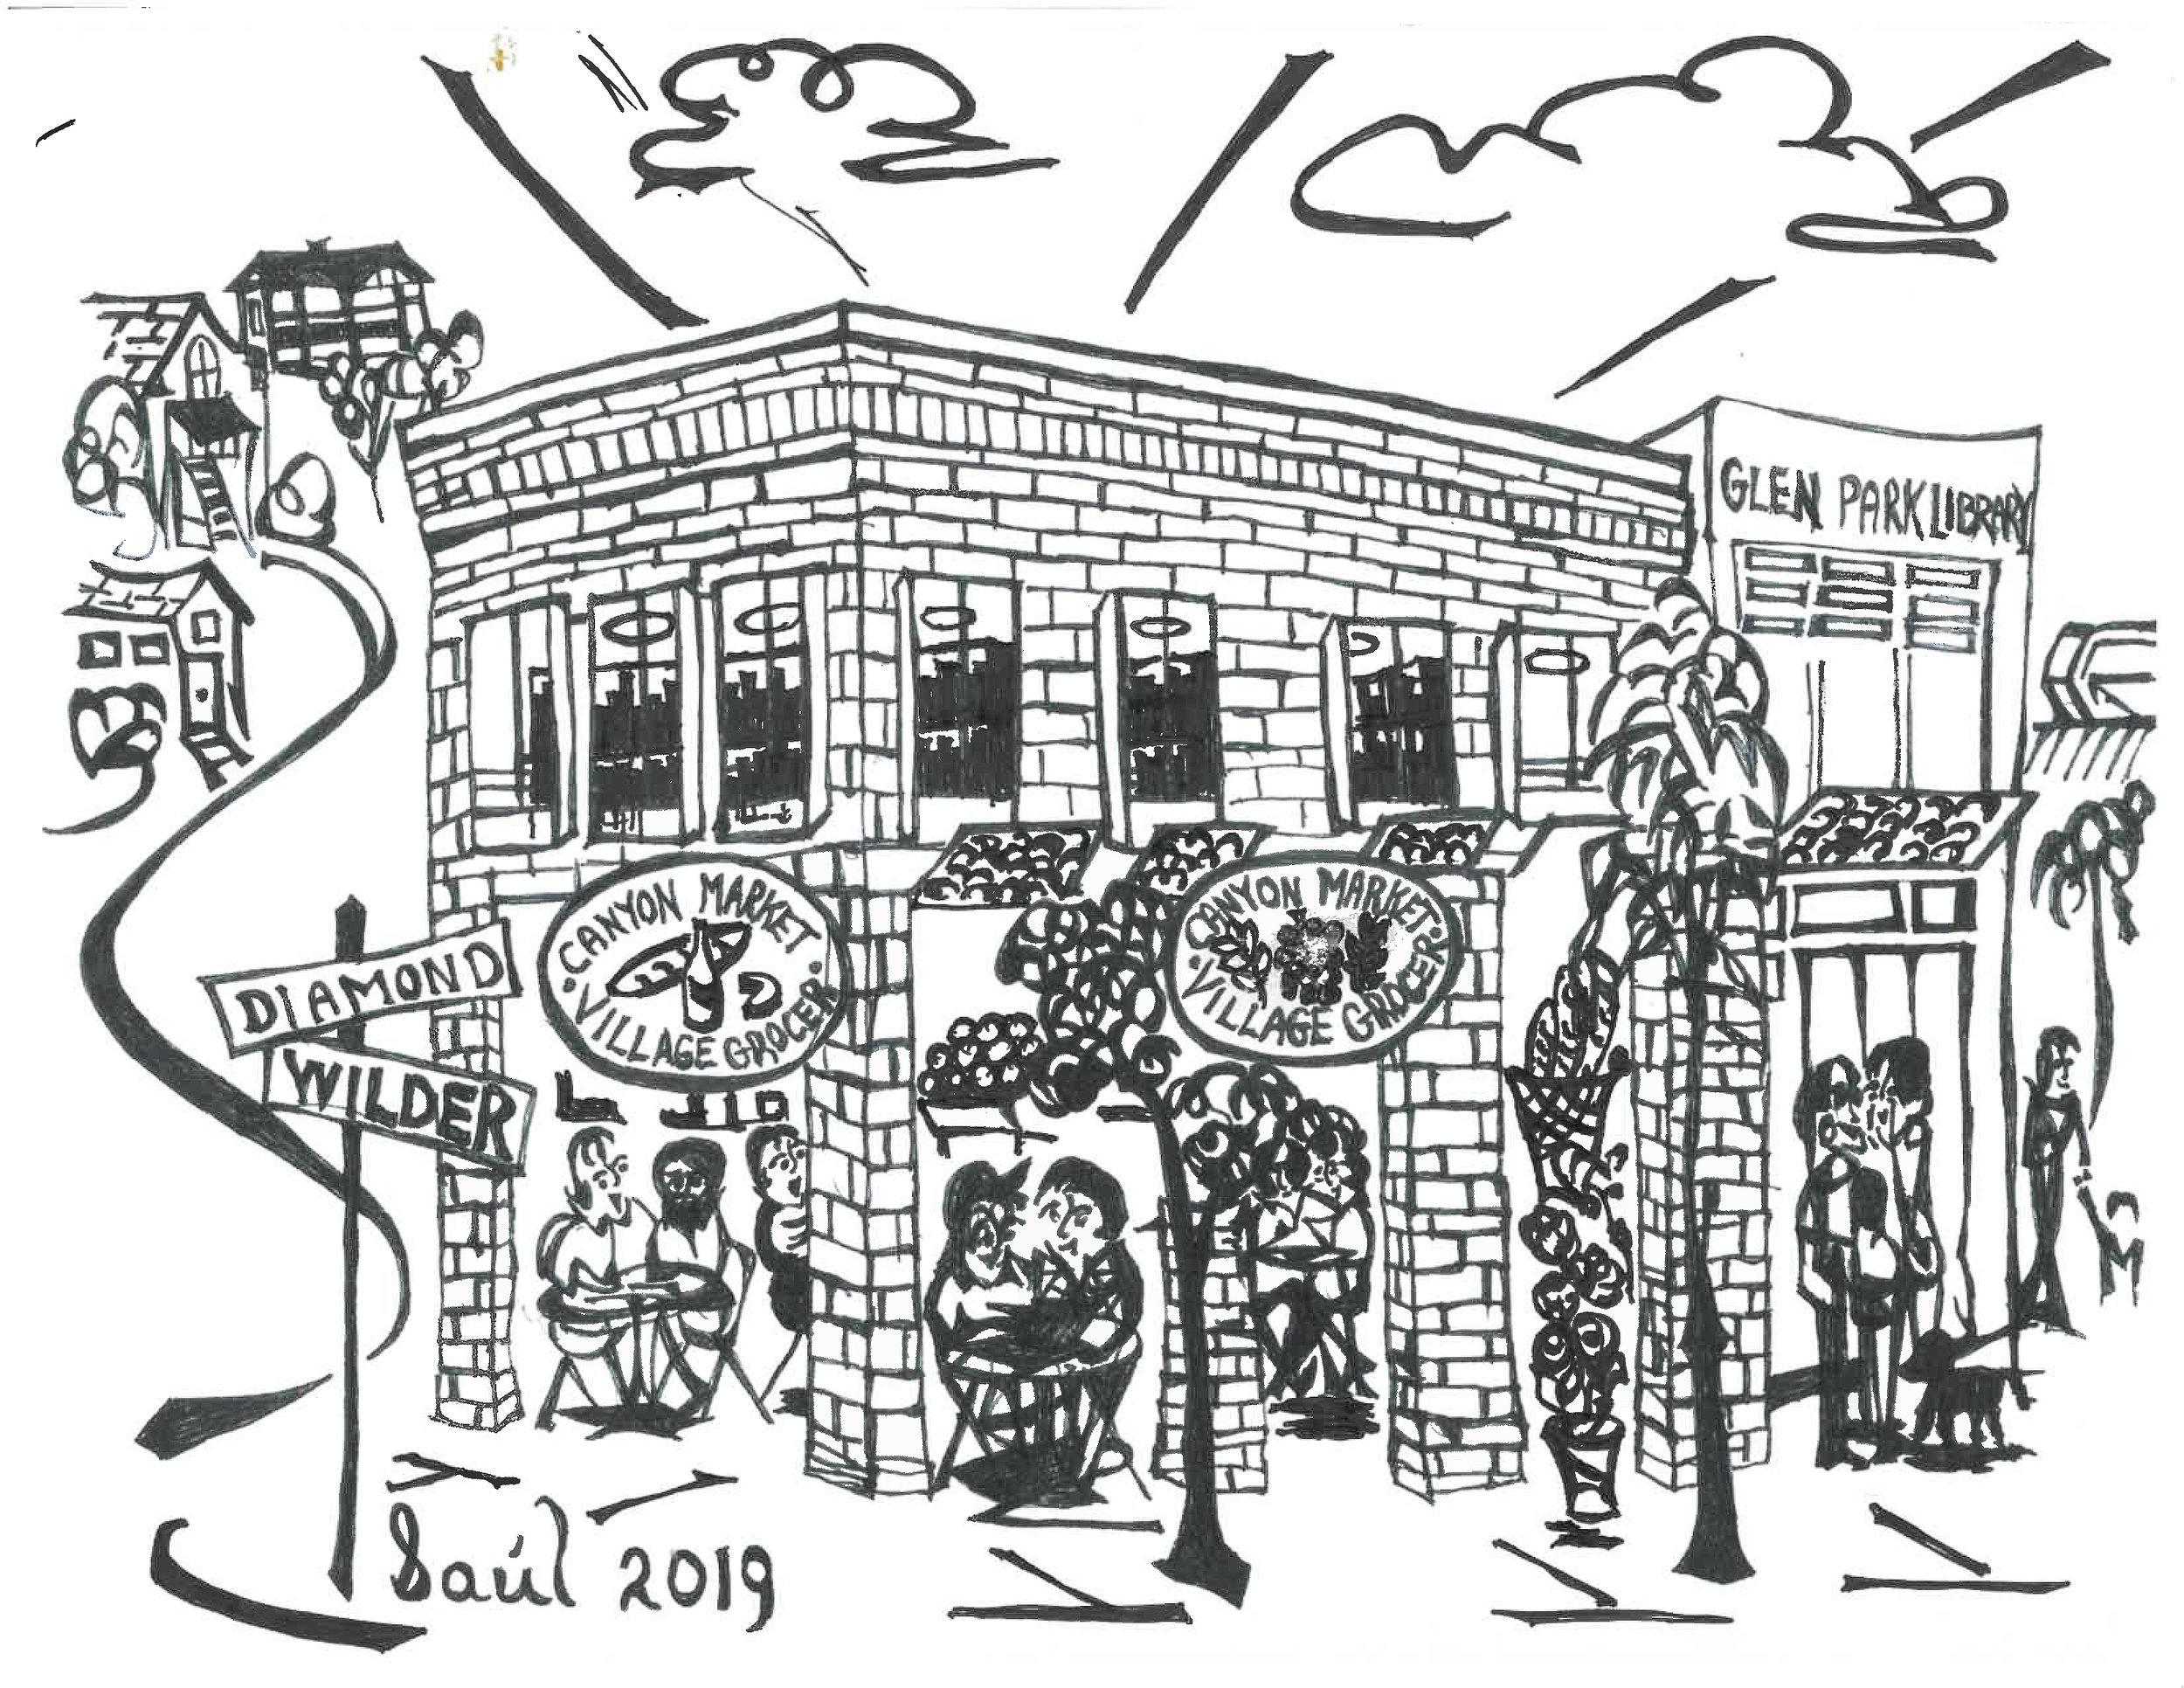 Canyon Market Drawing.jpg